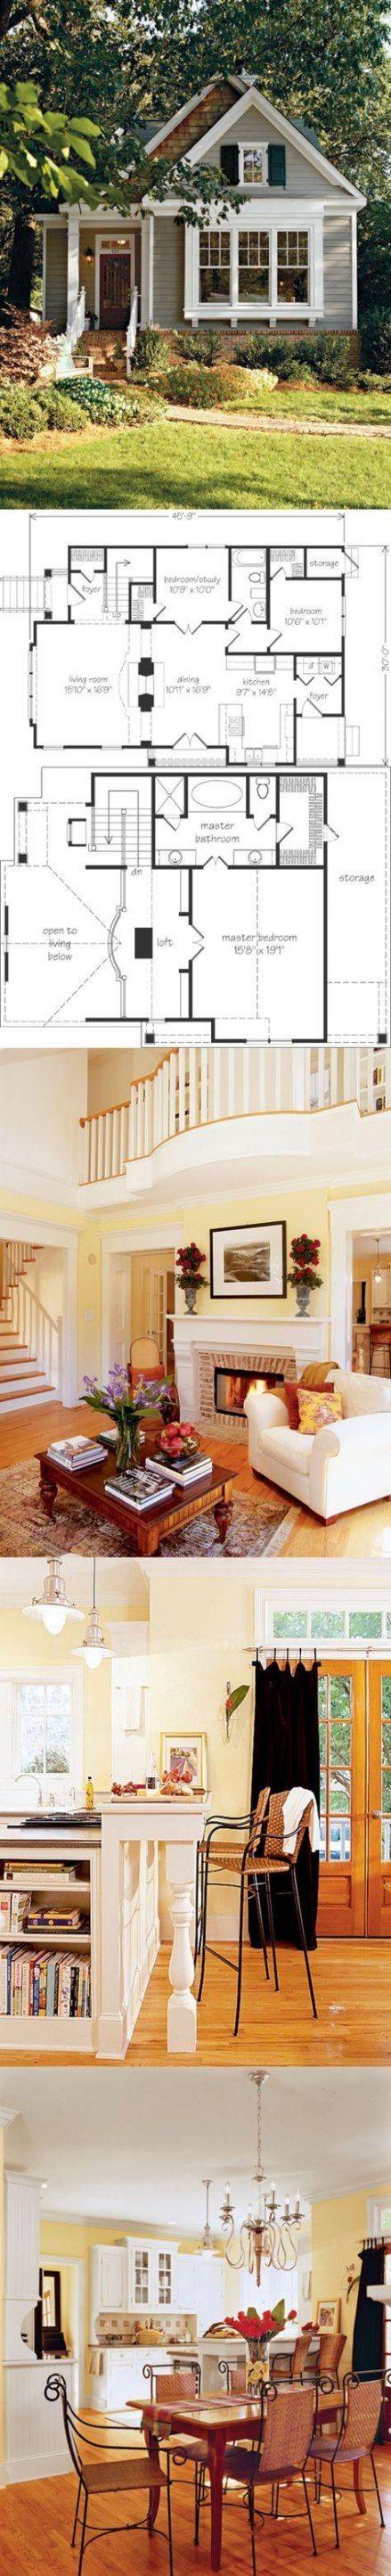 57 Ideas Bedroom Attic Small Floors For 2019 Craftsman House Plans House Plans New House Plans